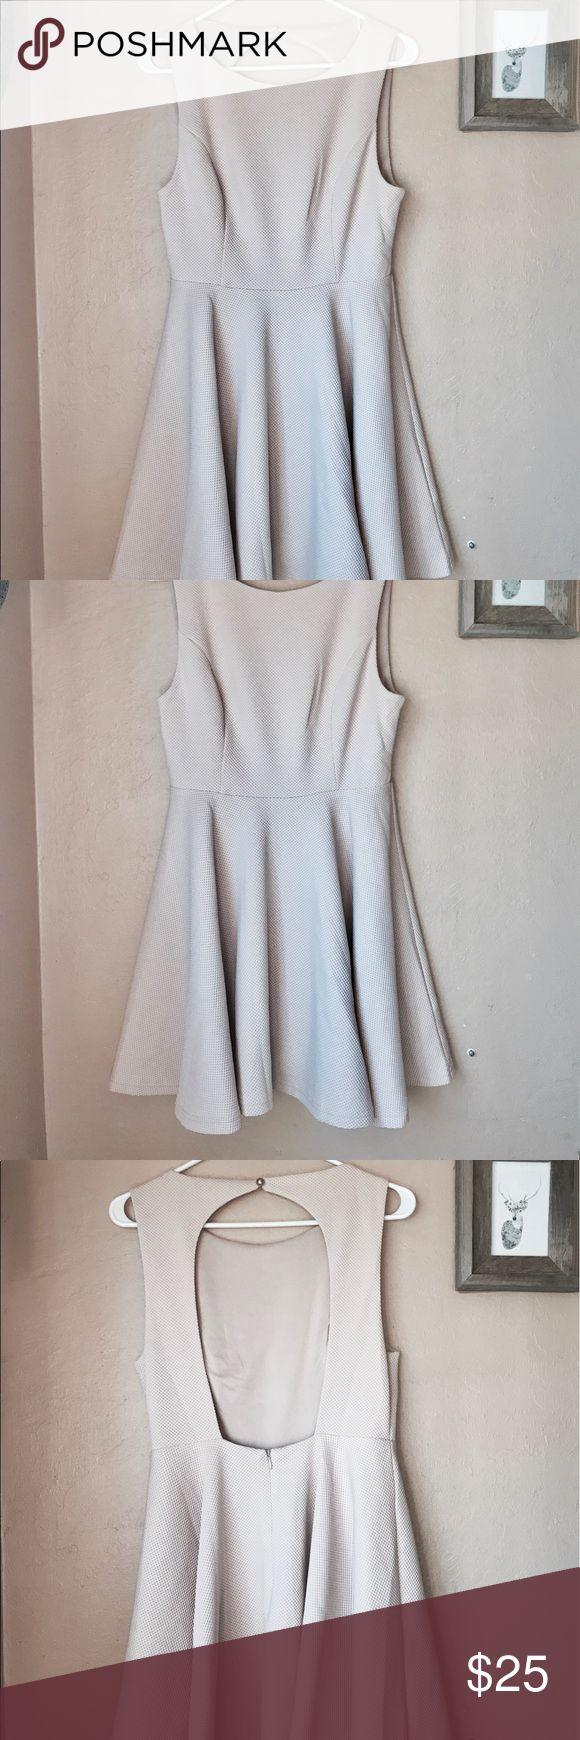 nude mini dress worn once! super cute for date nights! Lulu's Dresses Mini